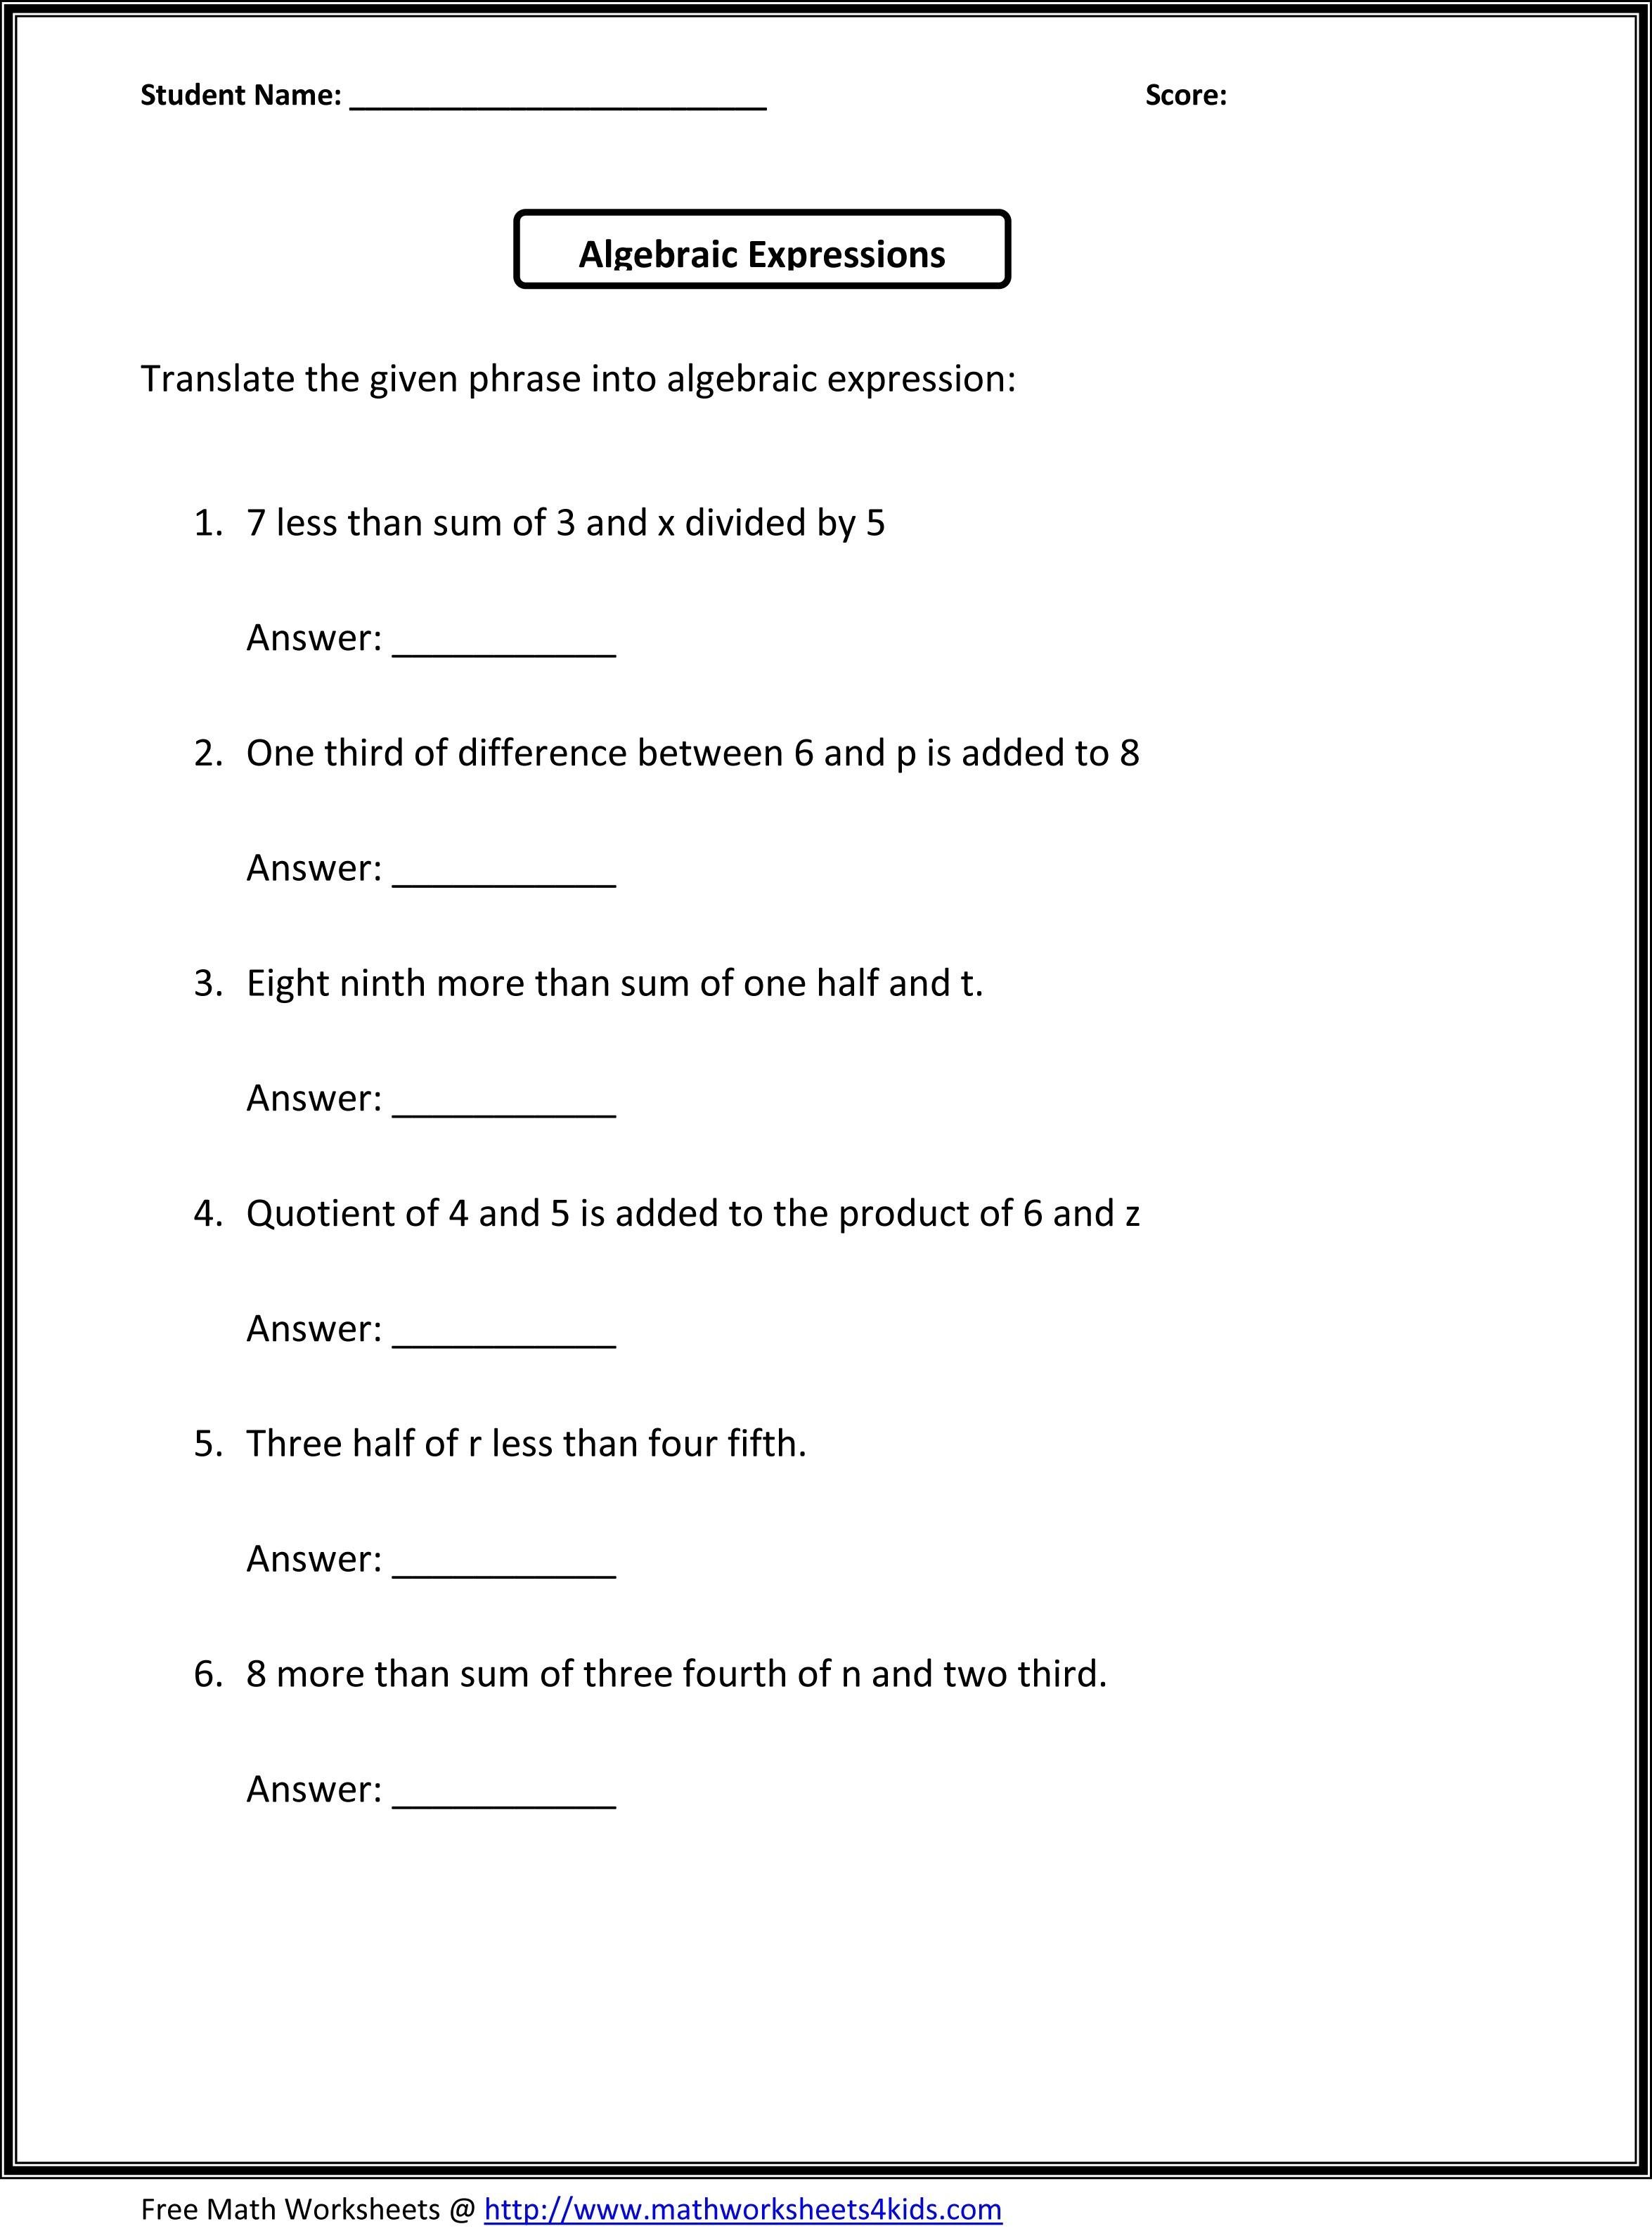 Grade 8 Math Worksheets And Problems Equations  1656579918 – Grade